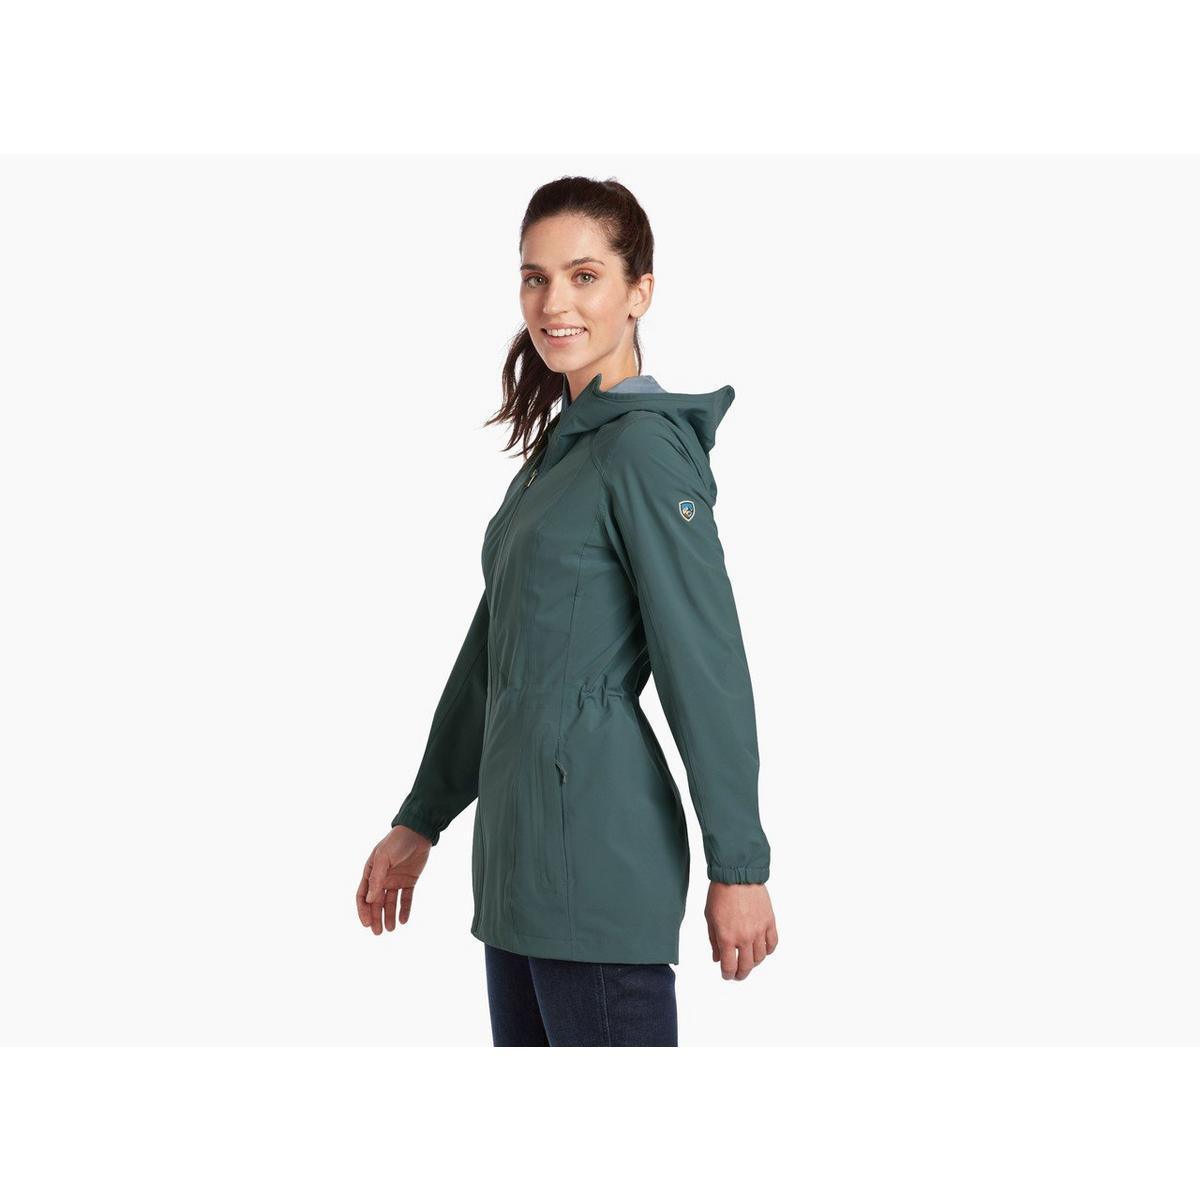 Kuhl Women's Stretch Voyagr Waterproof Jacket